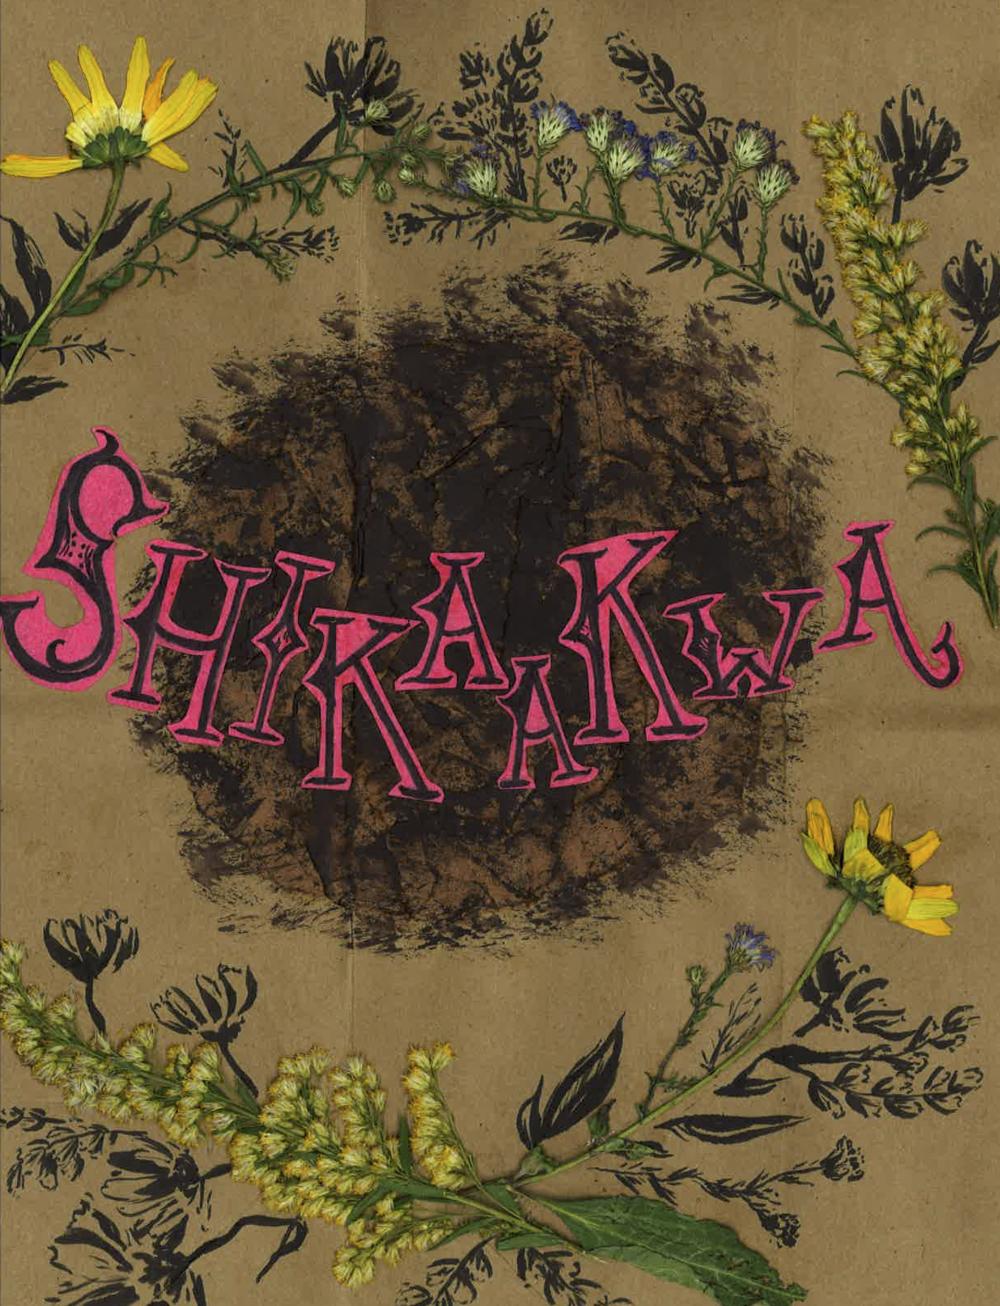 Shikaakwa cover.png